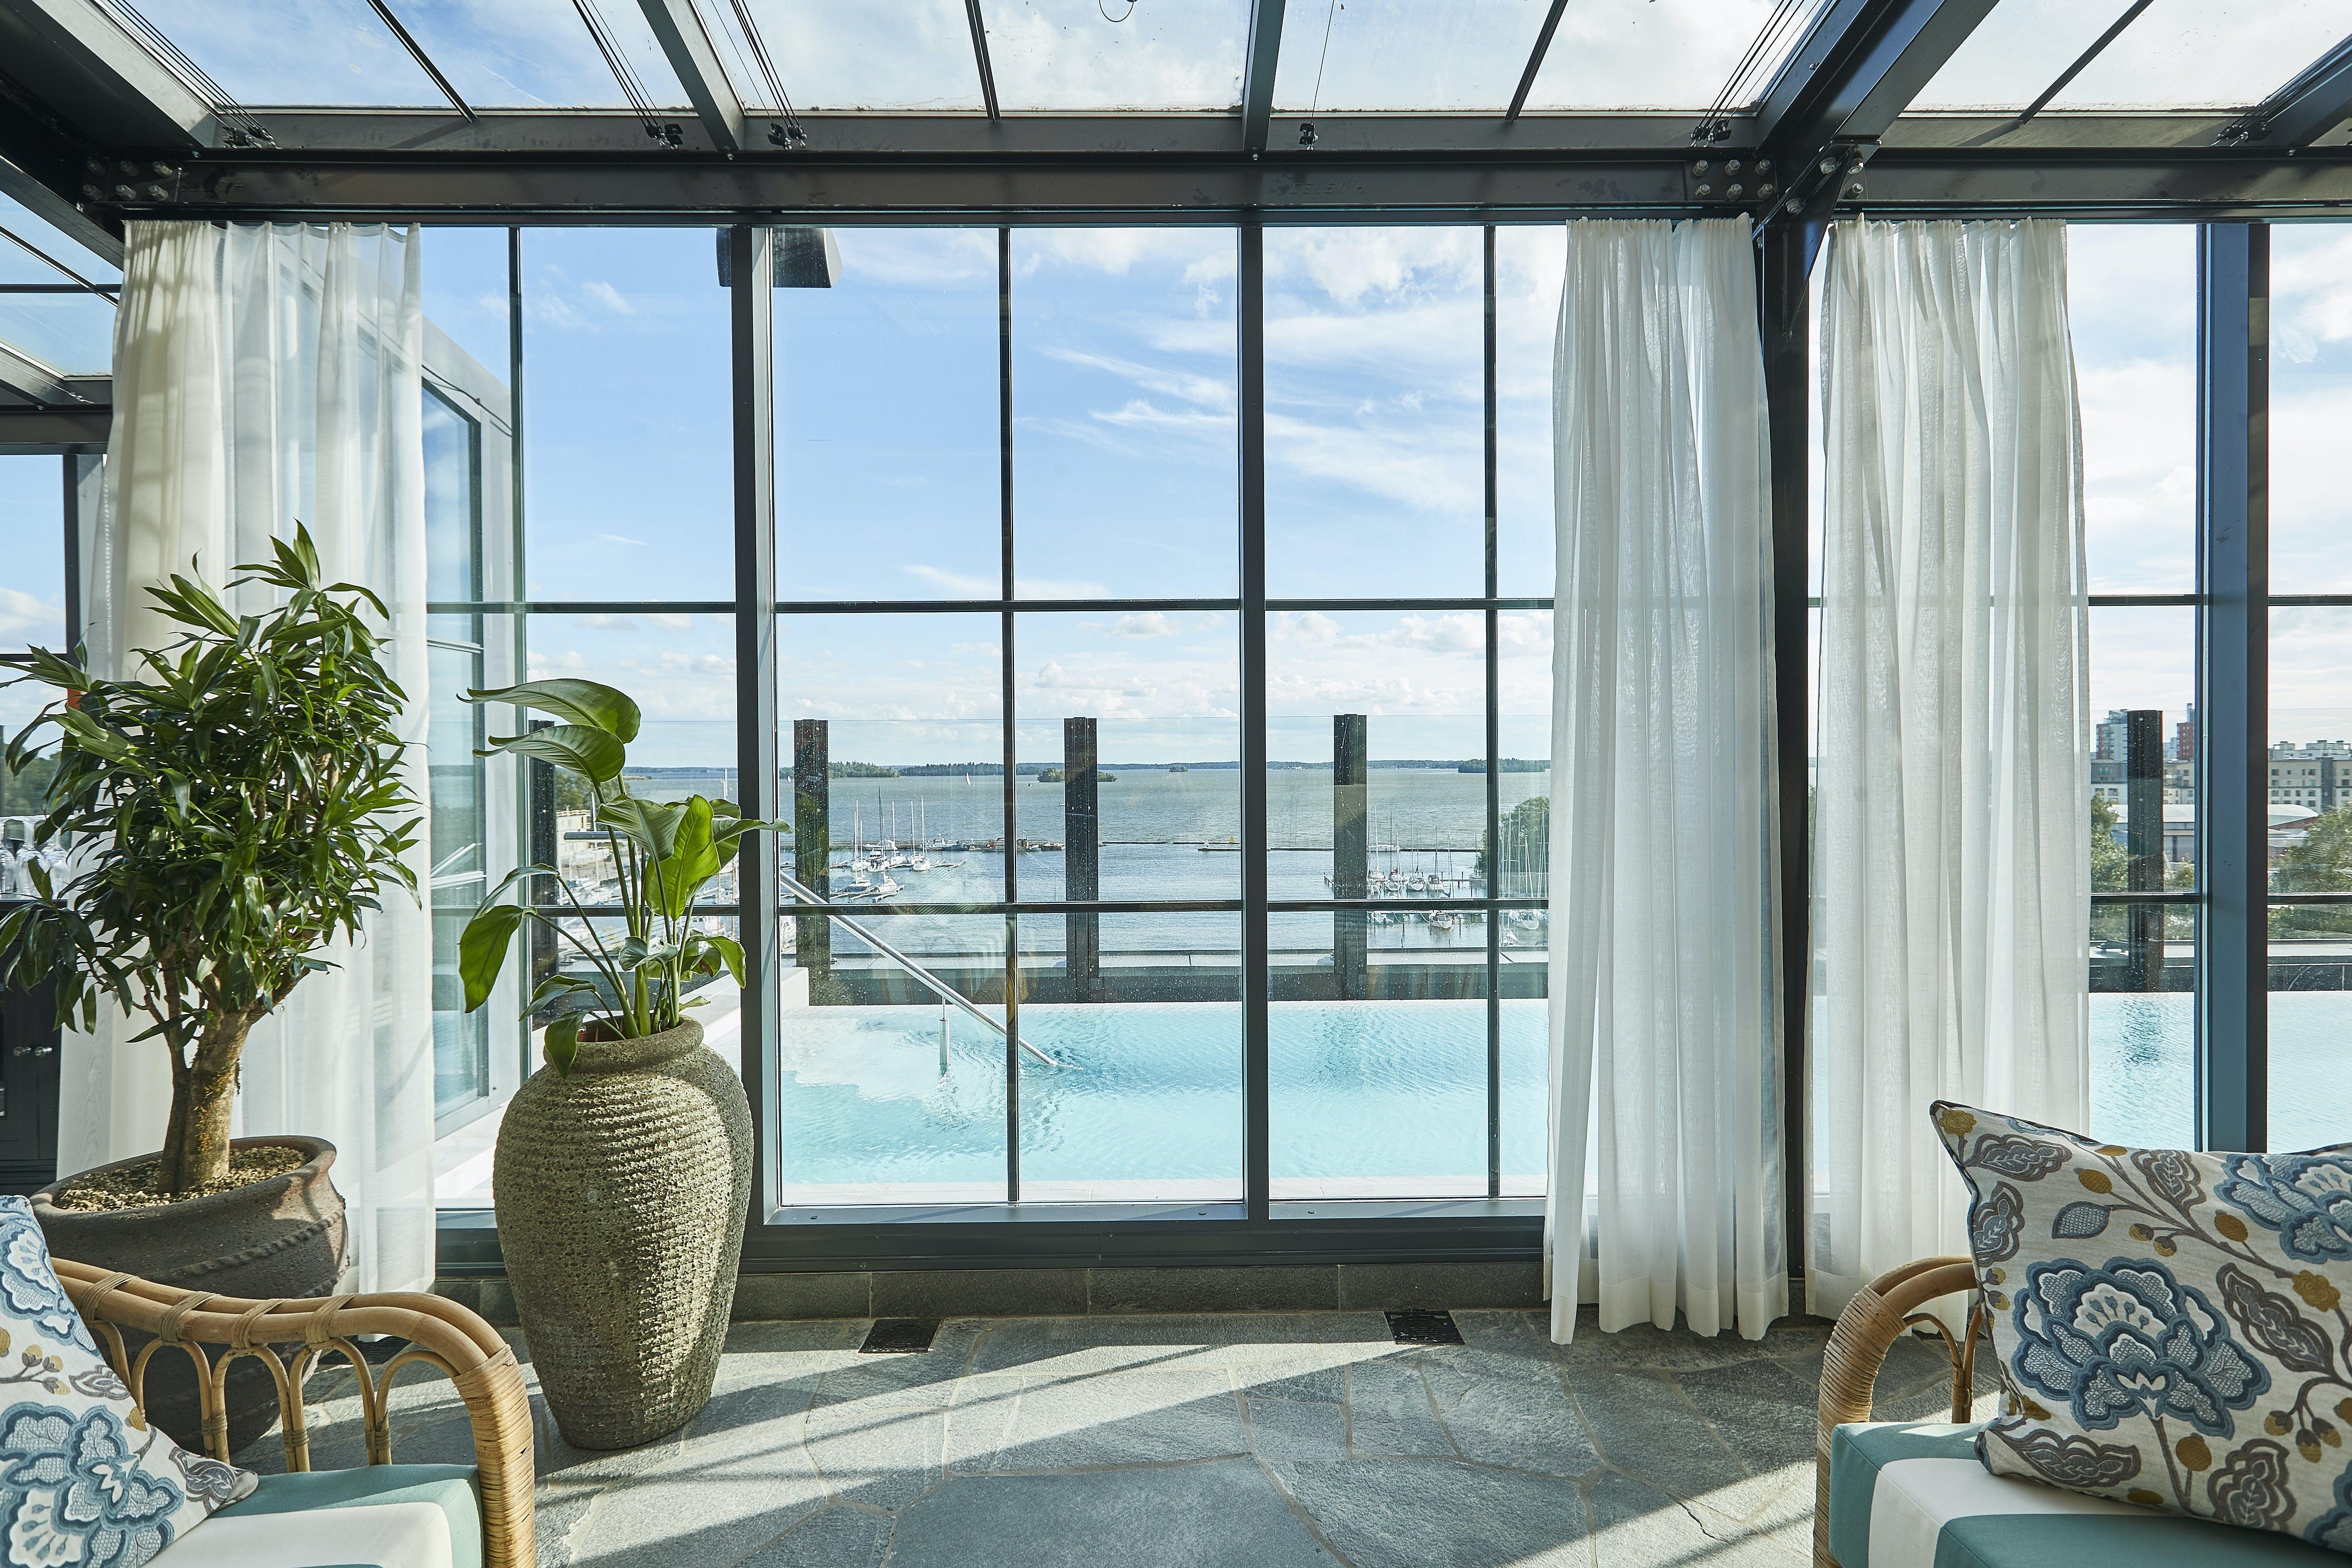 Hotel spa pool luksus